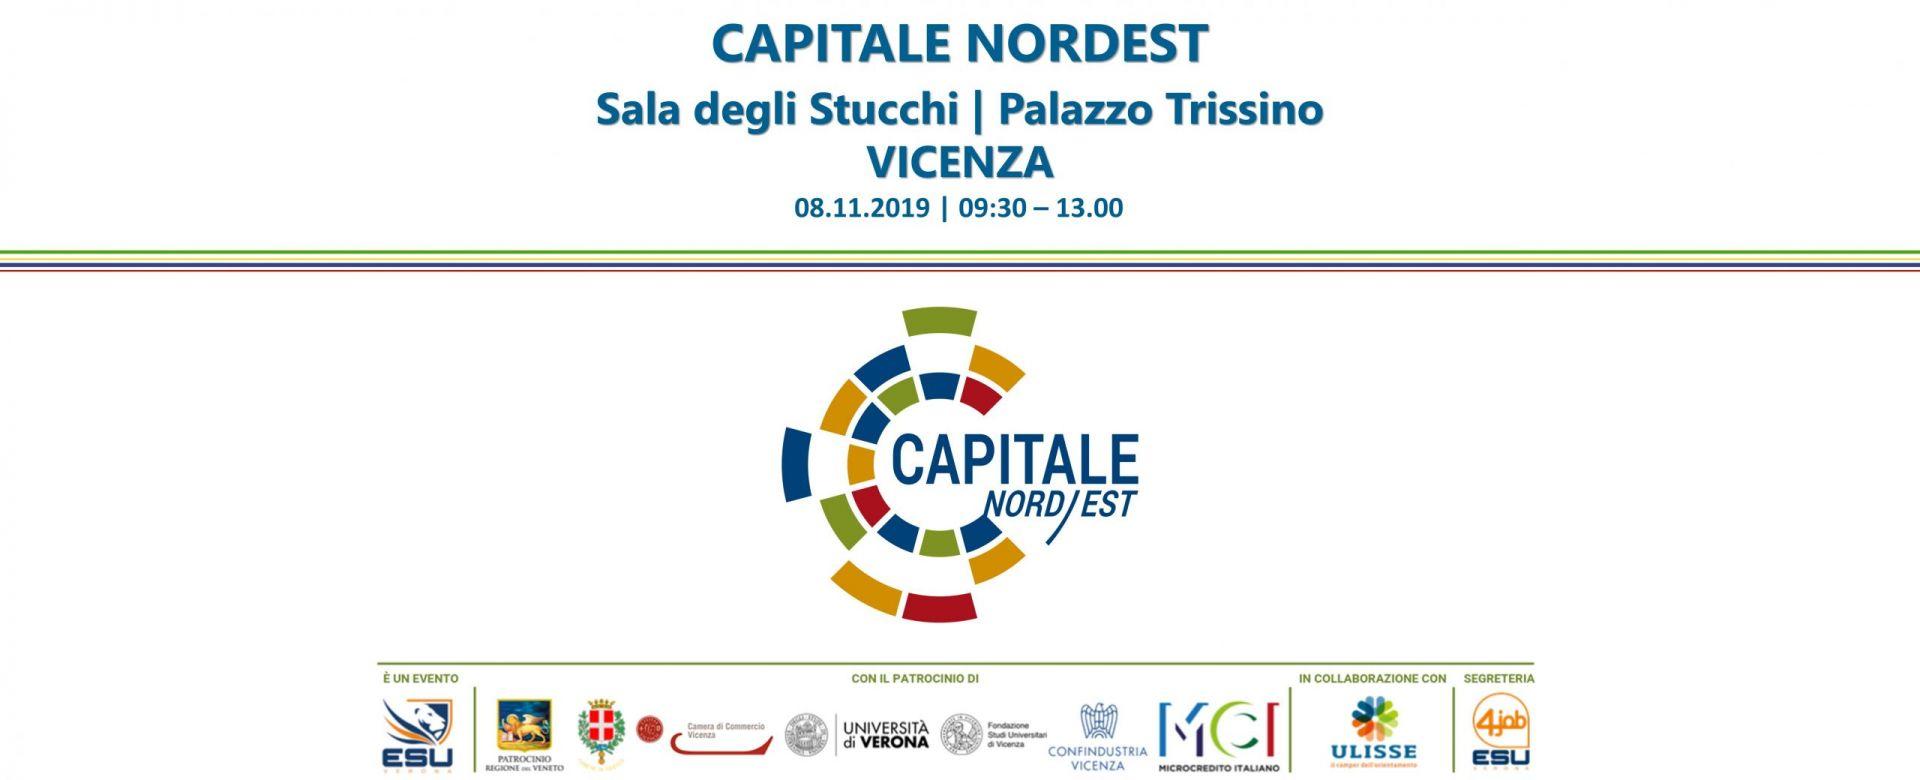 08.11.2019 - Capitale NordEst